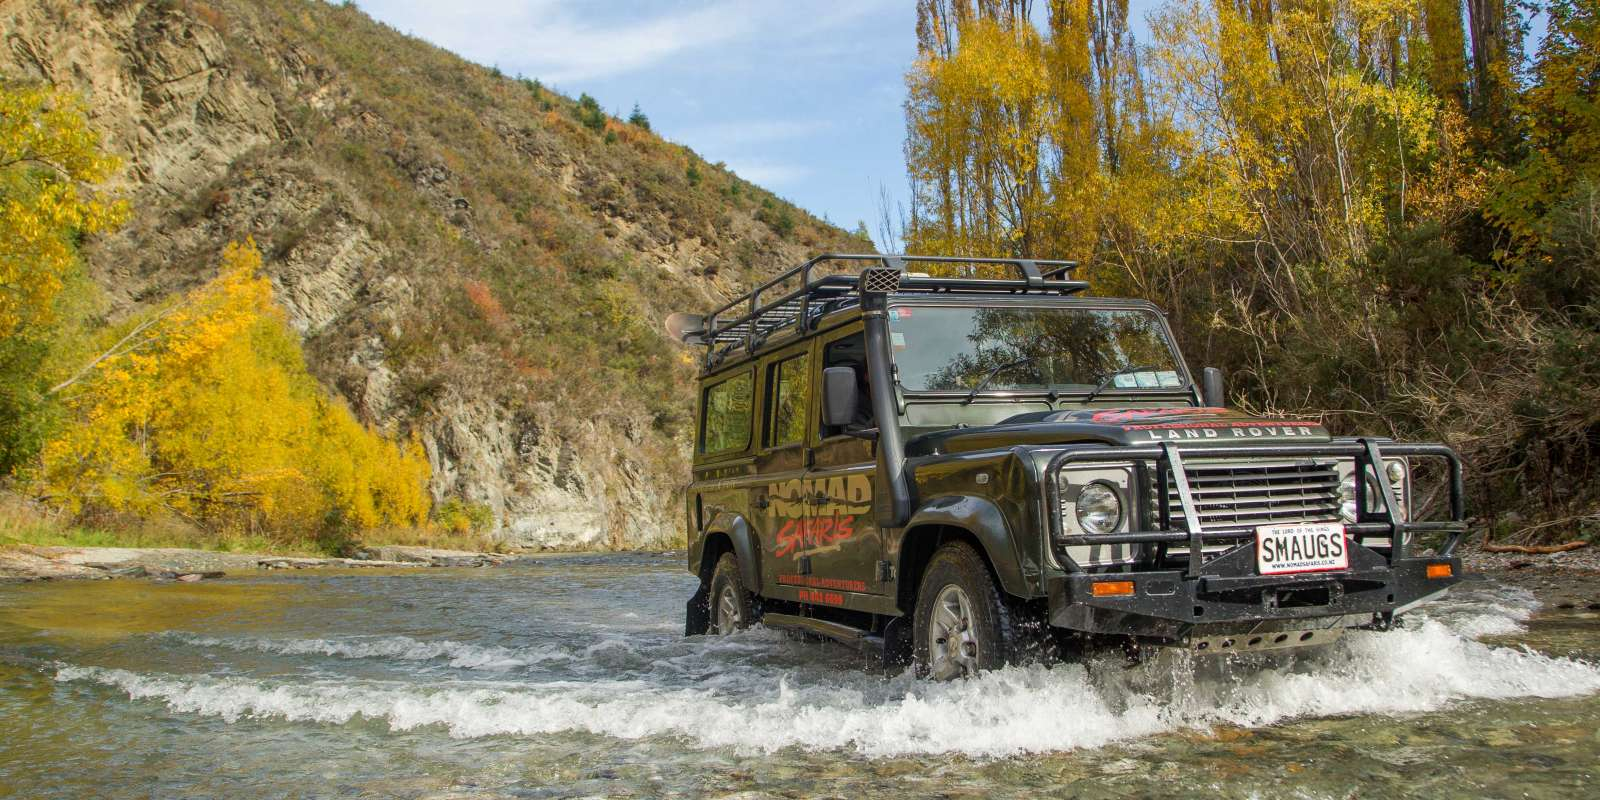 Nomad 4WD Safaris river crossing